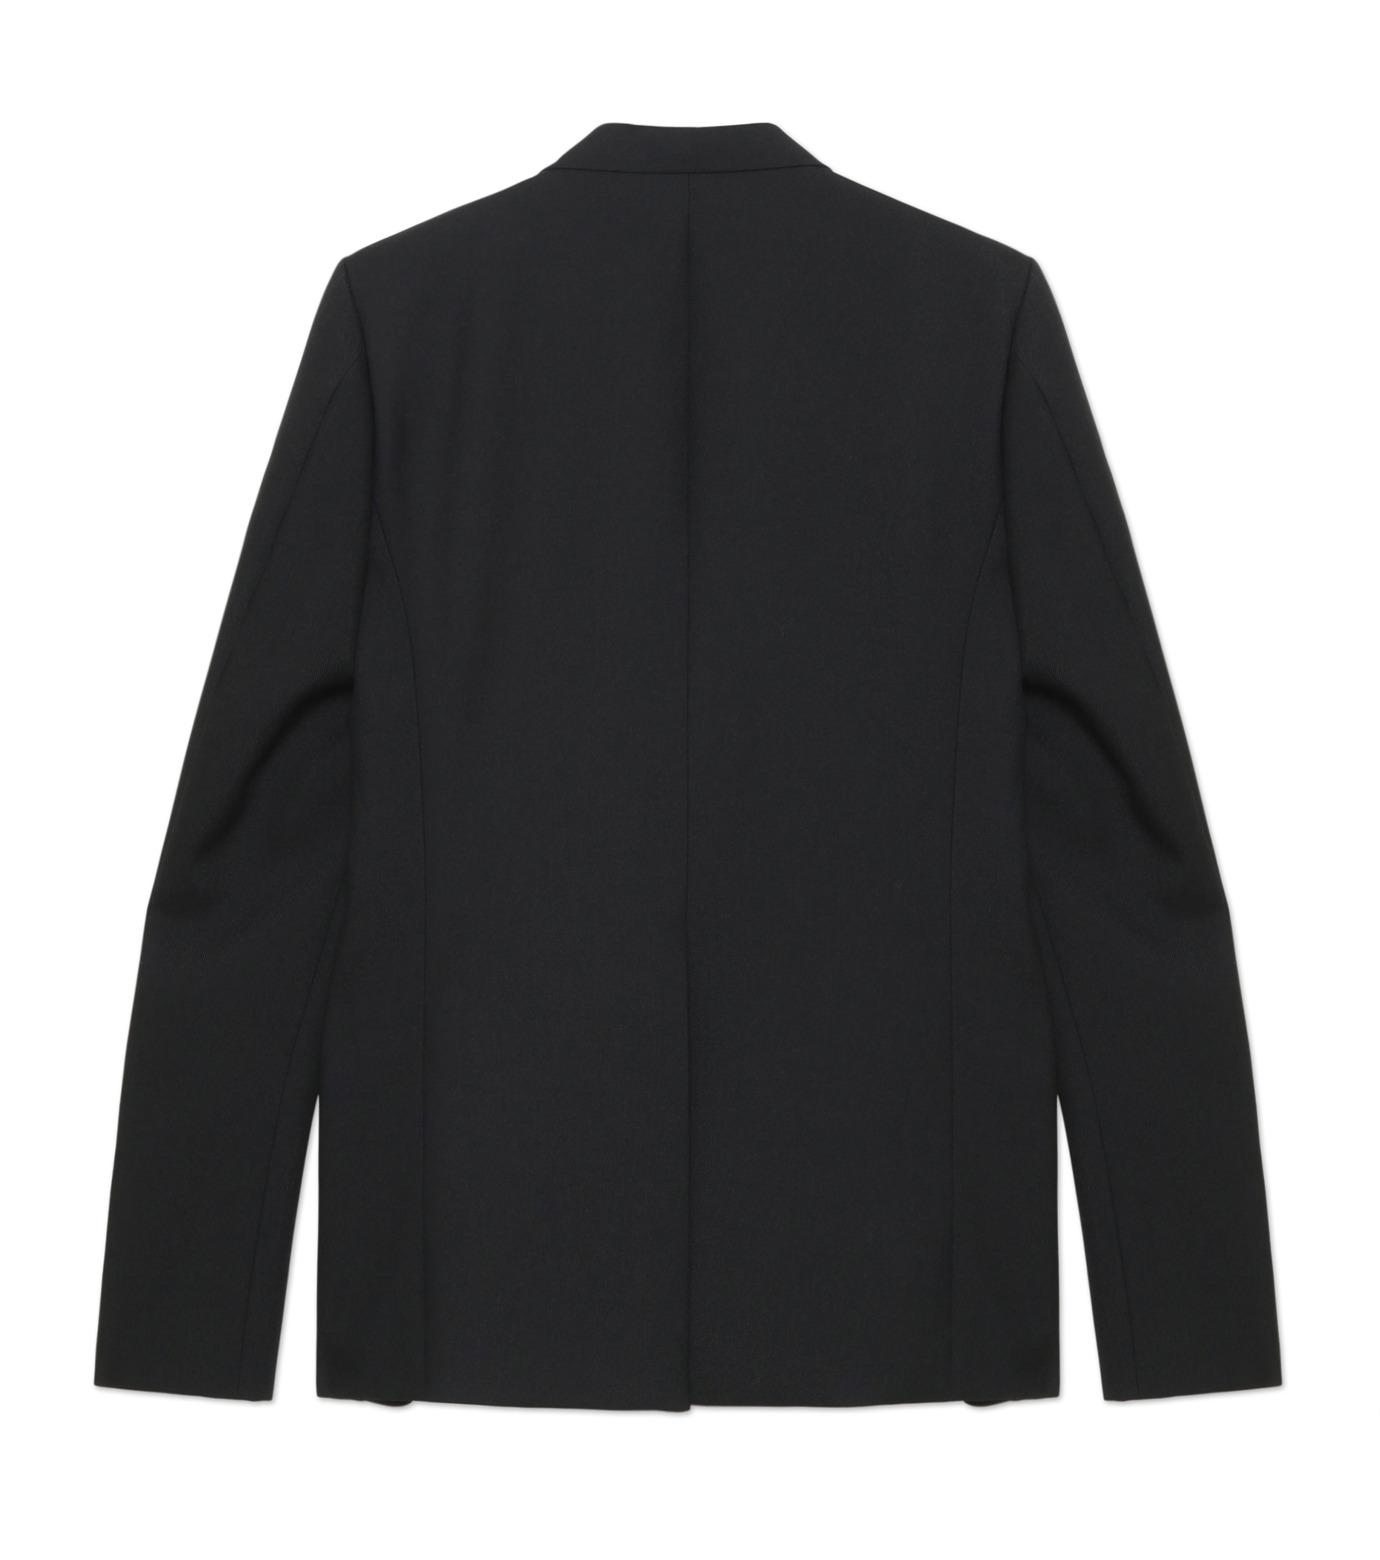 HL HEDDIE LOVU(エイチエル・エディールーヴ)のPEAKED LAPEL 1B JK-BLACK(ジャケット/jacket)-18S94005-13 拡大詳細画像5